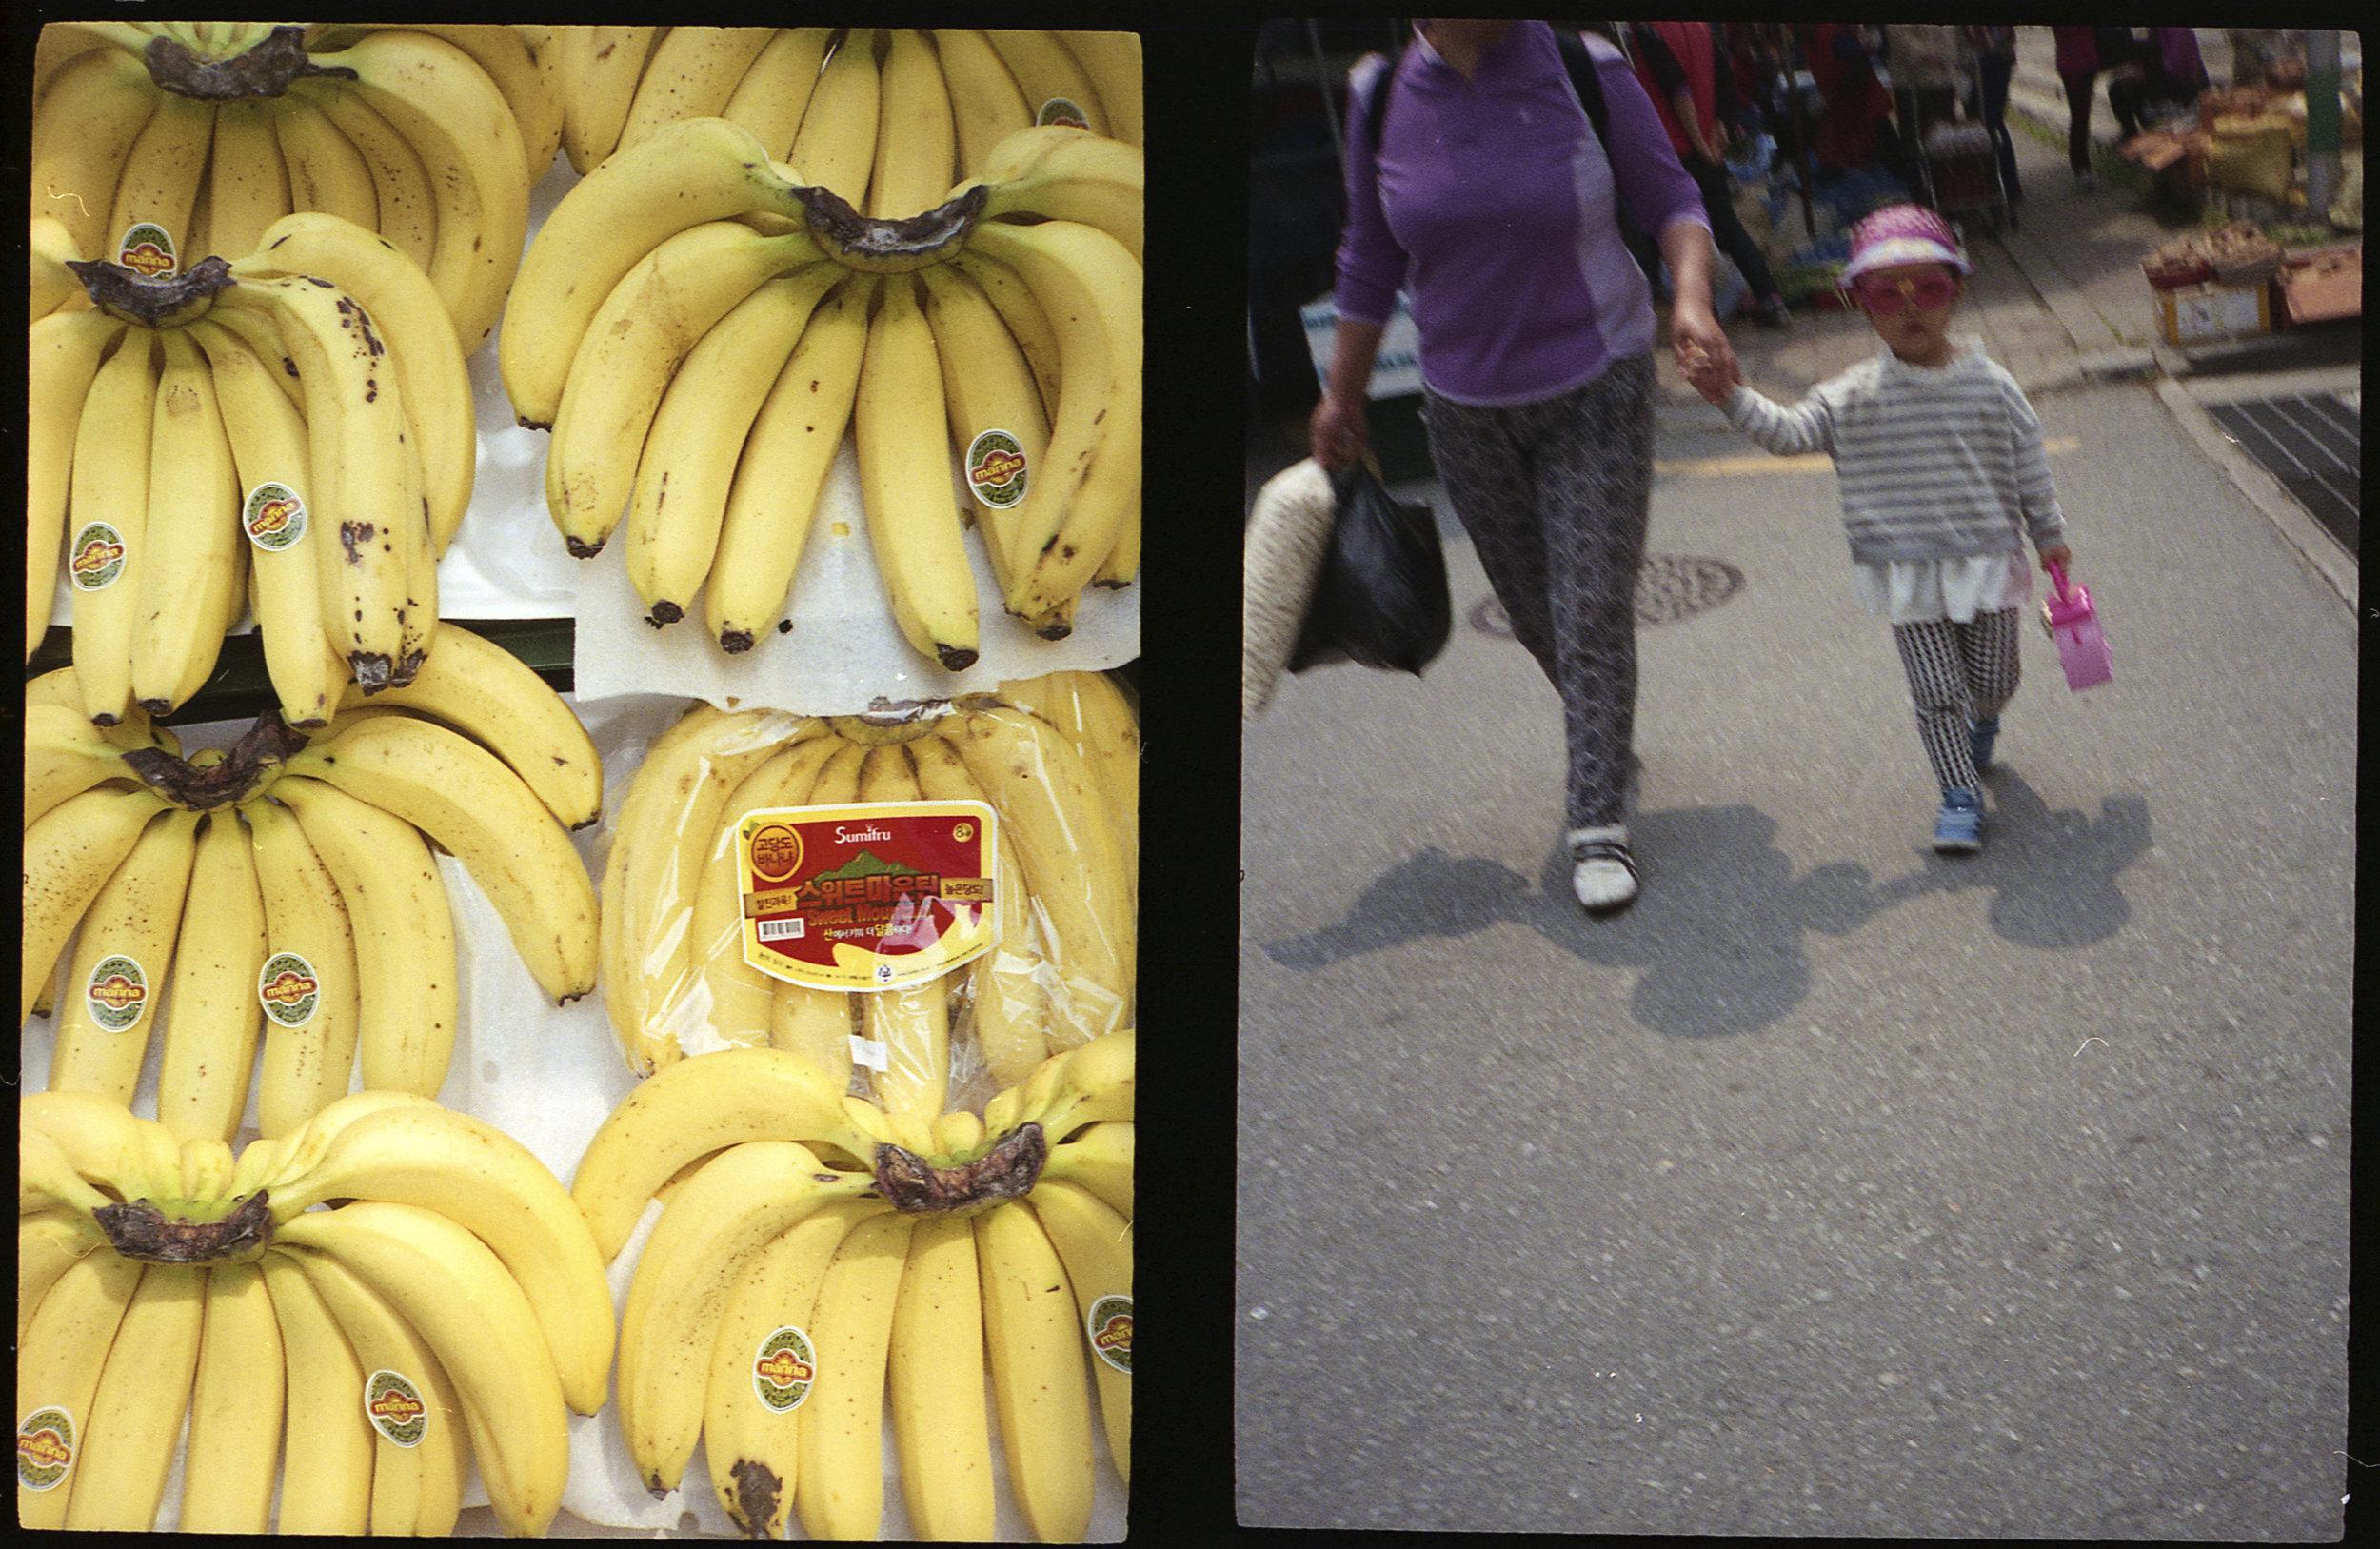 Bananas and Stylish Kid